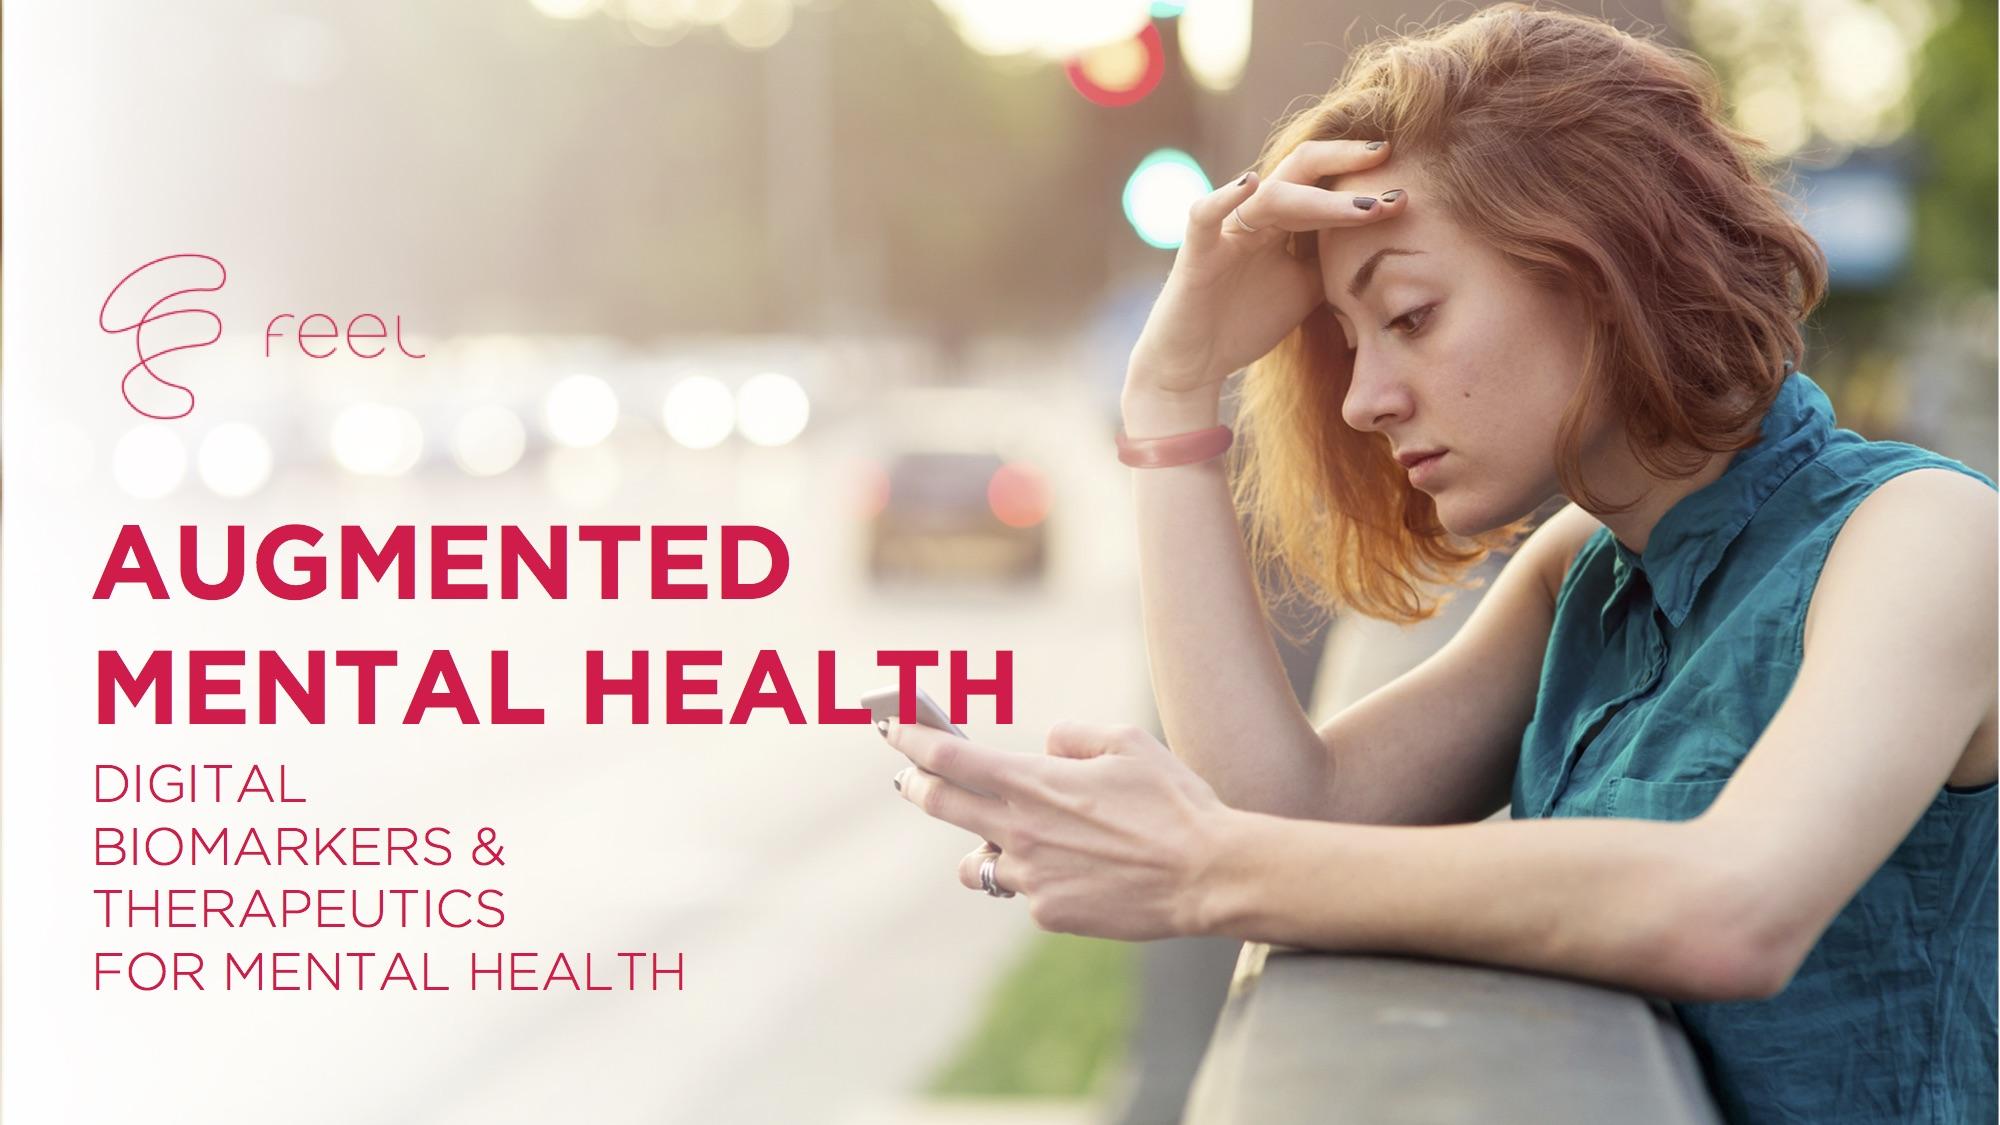 Sentio: Digital Biomarkers and Therapeutics for Mental Health